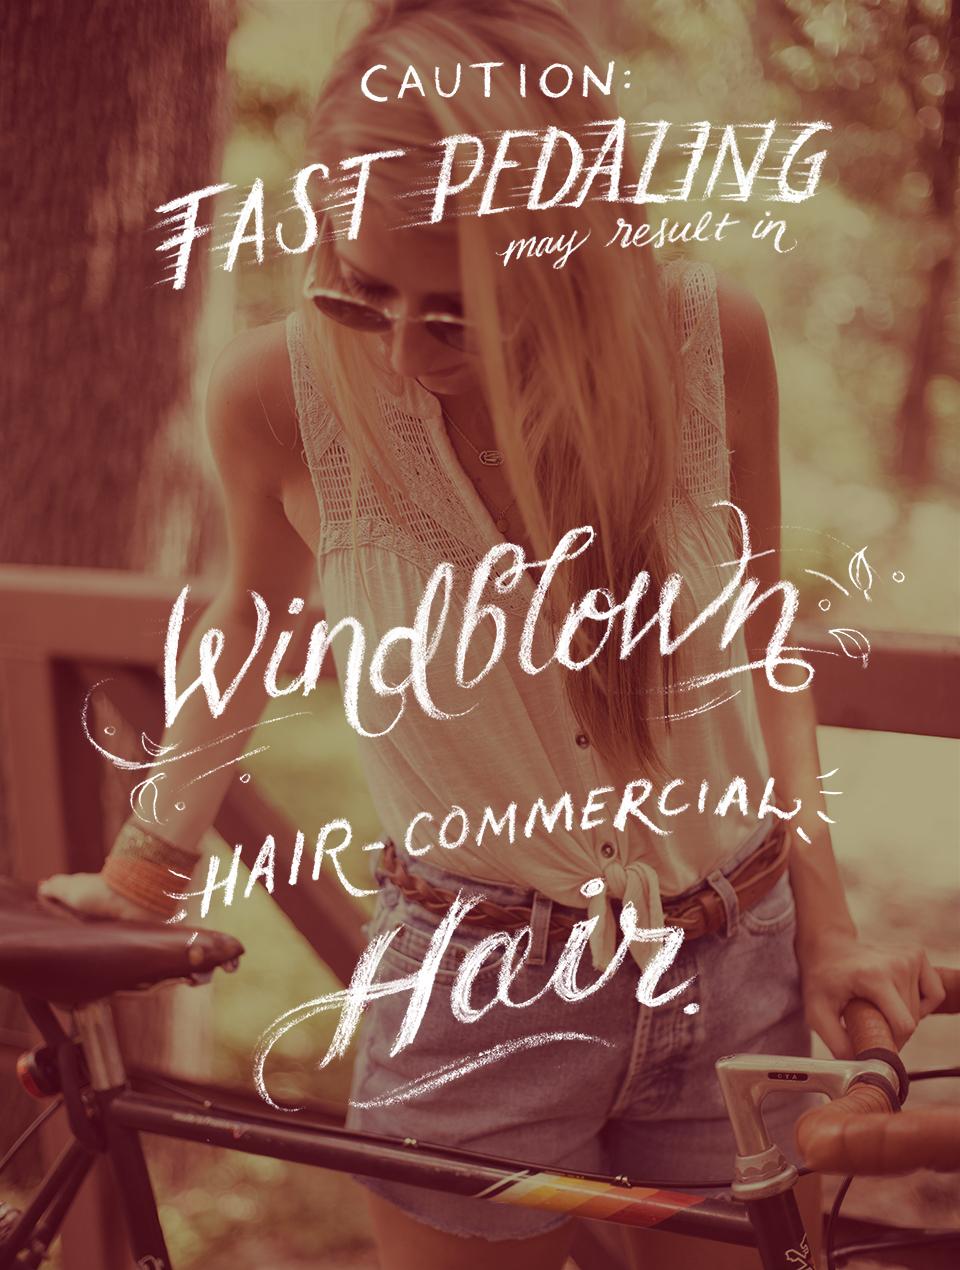 hair commercial hair.jpg